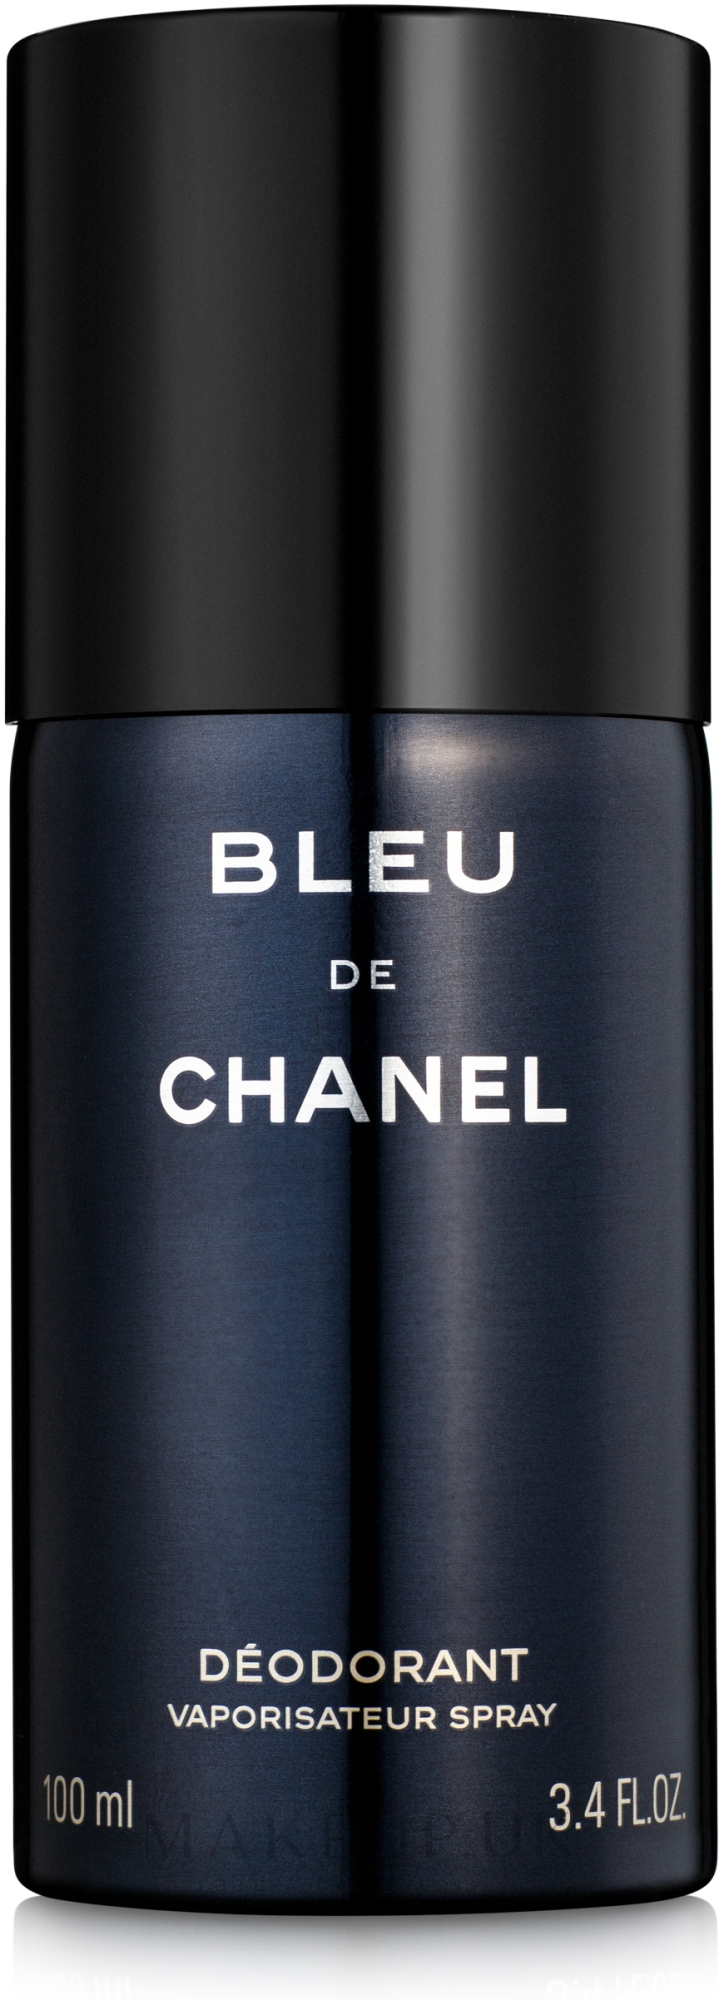 Chanel Bleu de Chanel - Deodorant — photo 100 ml